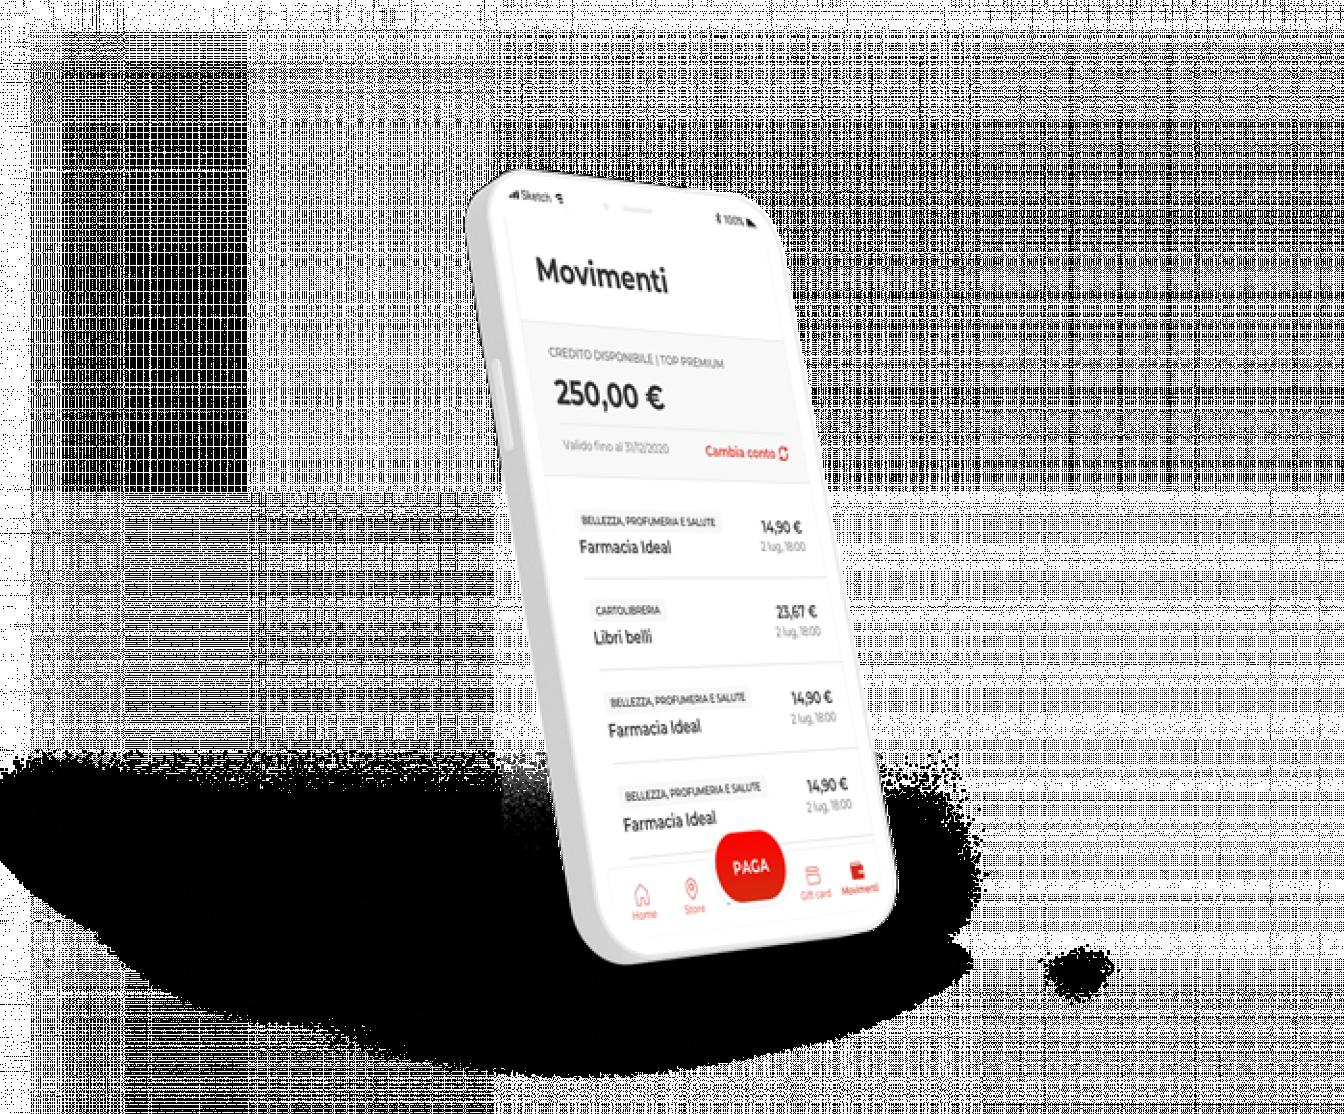 App-Buoni-AcquistoTicket-Compliments-MyEdenred-Shopping-saldo